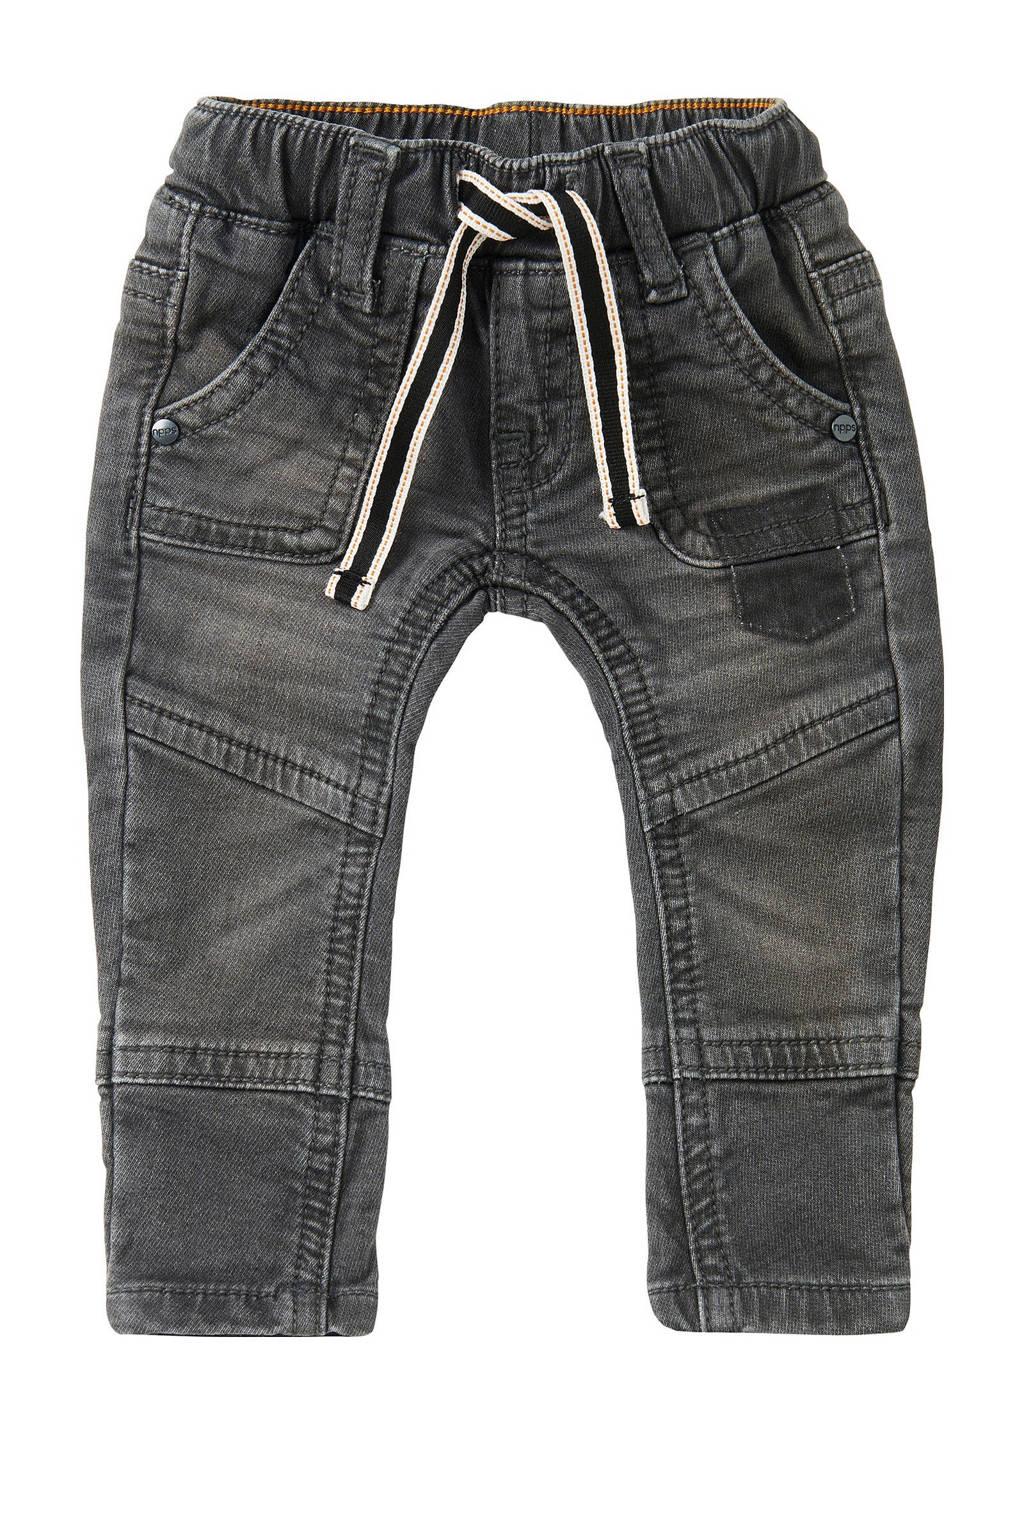 Noppies baby regular fit jeans Rawsonville grijs stonewashed, Grijs stonewashed